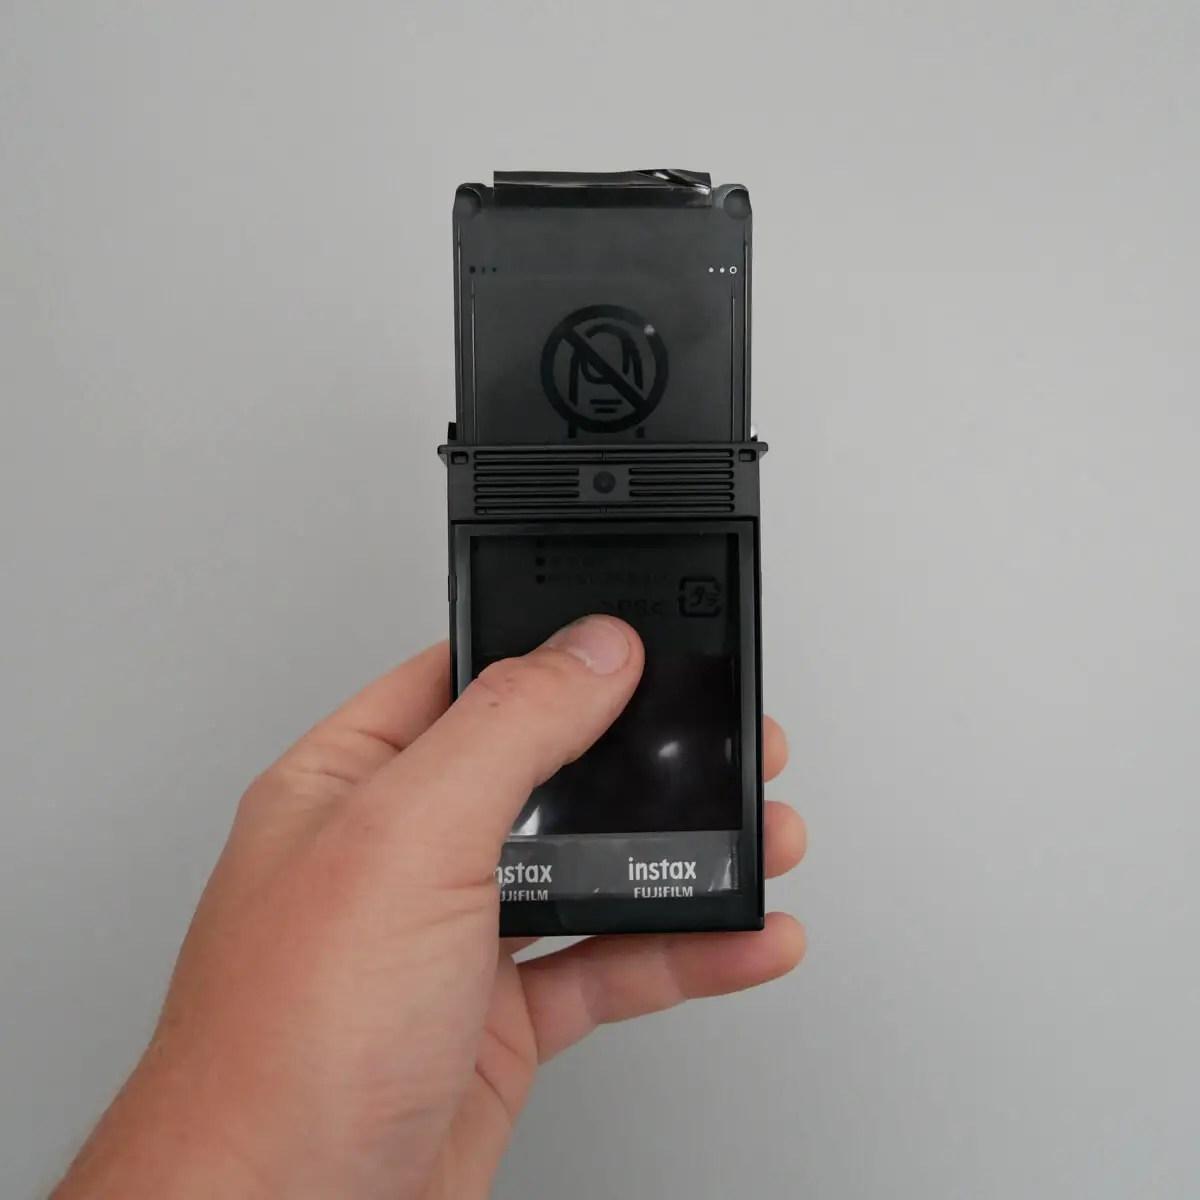 Extraction 2 - Fujifilm Instax Mini in a 35mm camera